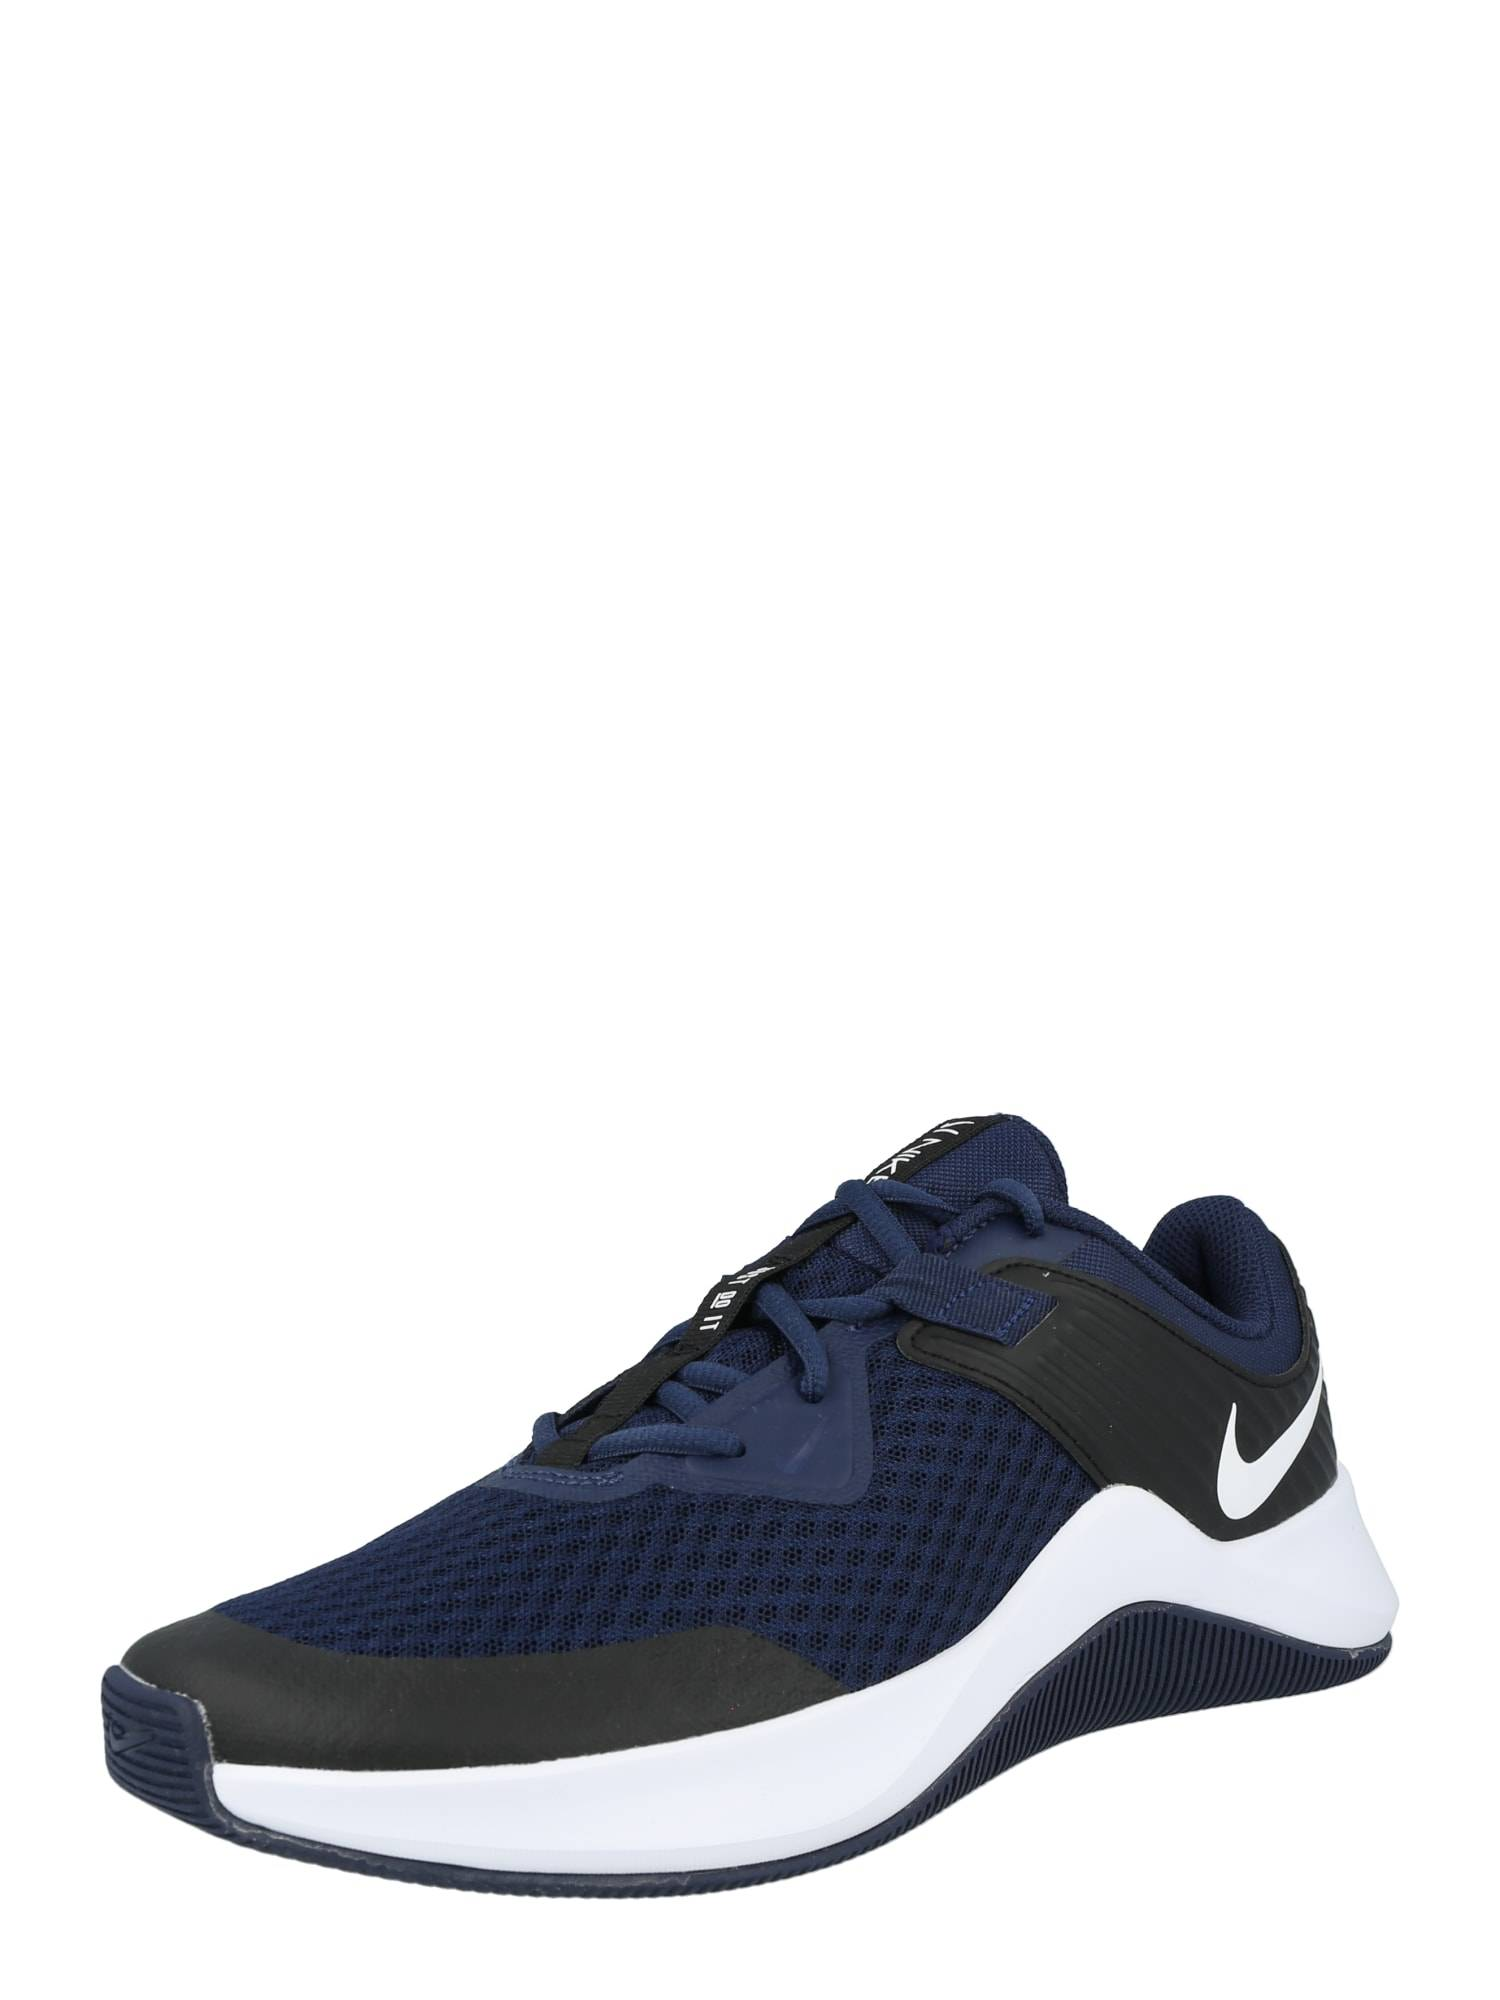 NIKE Chaussure de sport 'MC Trainer'  - Bleu - Taille: 11 - male